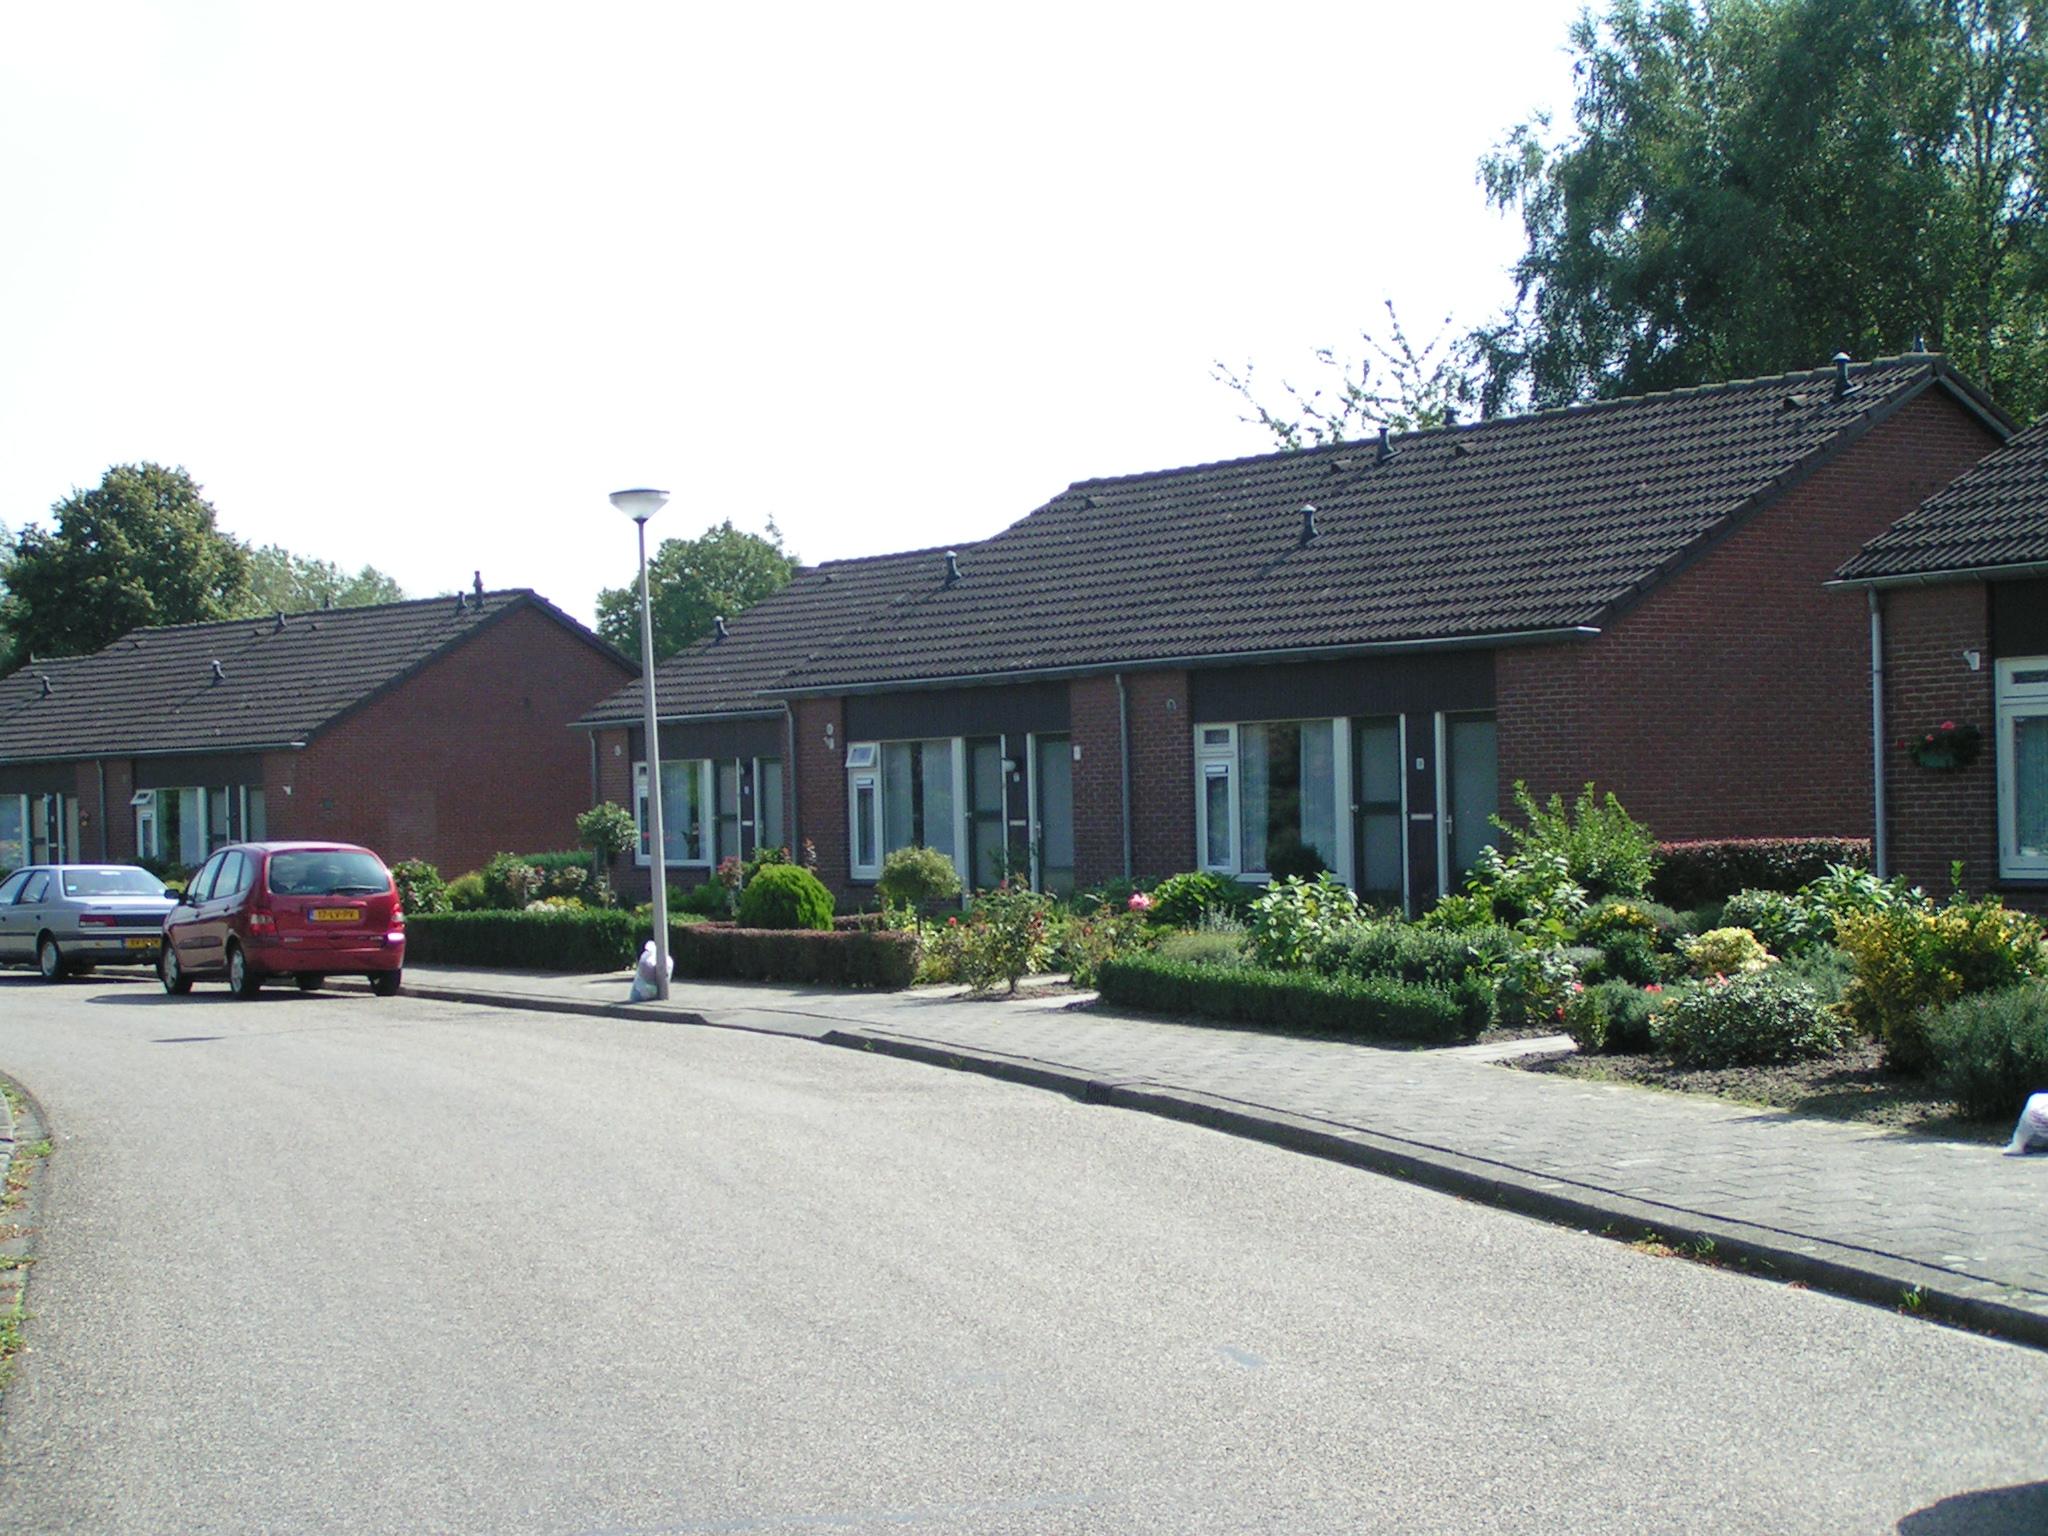 Seniorenwoningen in Hegelsom (gem. Horst a/d Maas)